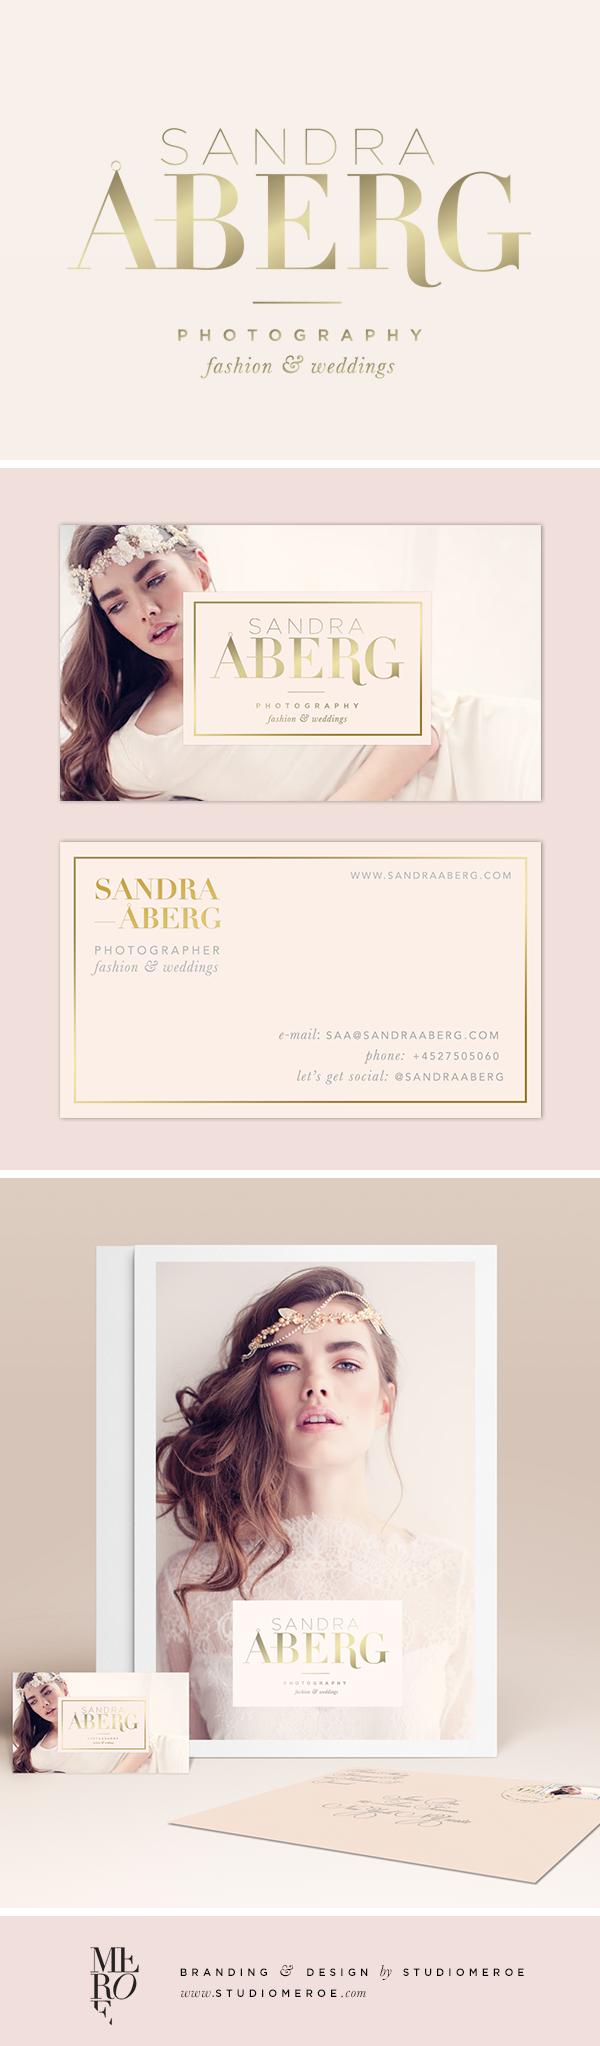 Branding for sandra aberg wedding fashion photographer feminine branding for sandra aberg wedding fashion photographer feminine logo business card design and other marketing materials designed by studiomeroe colourmoves